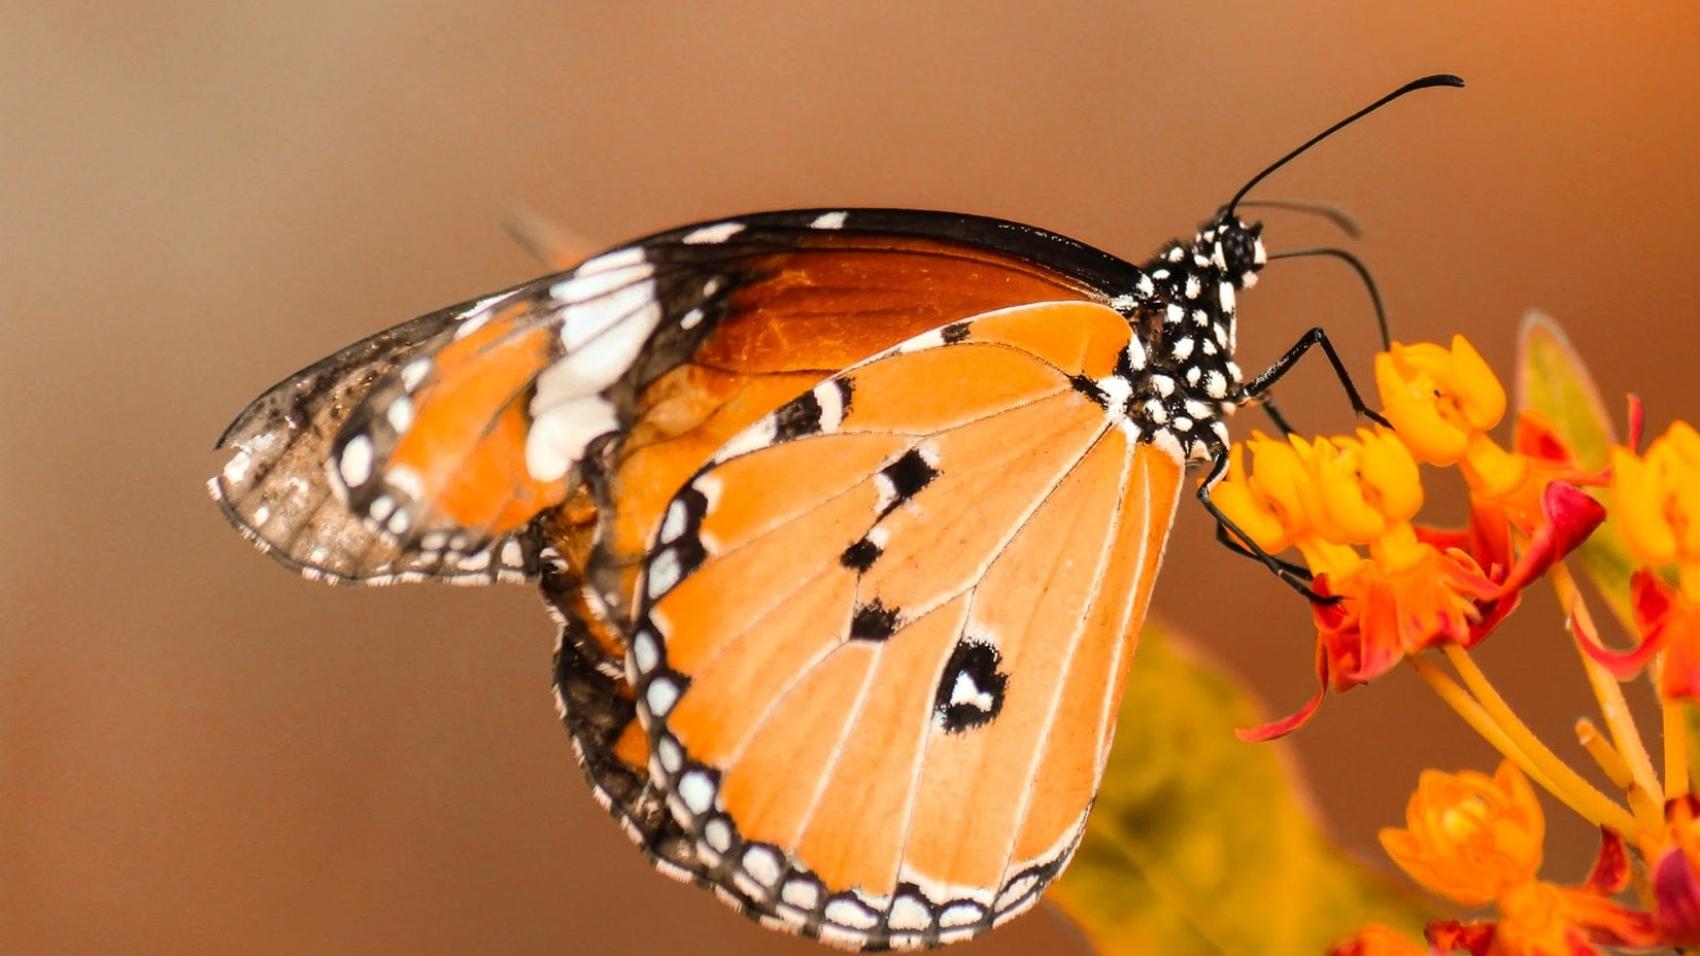 5 Interesting Facts To Teach Kids about Butterflies